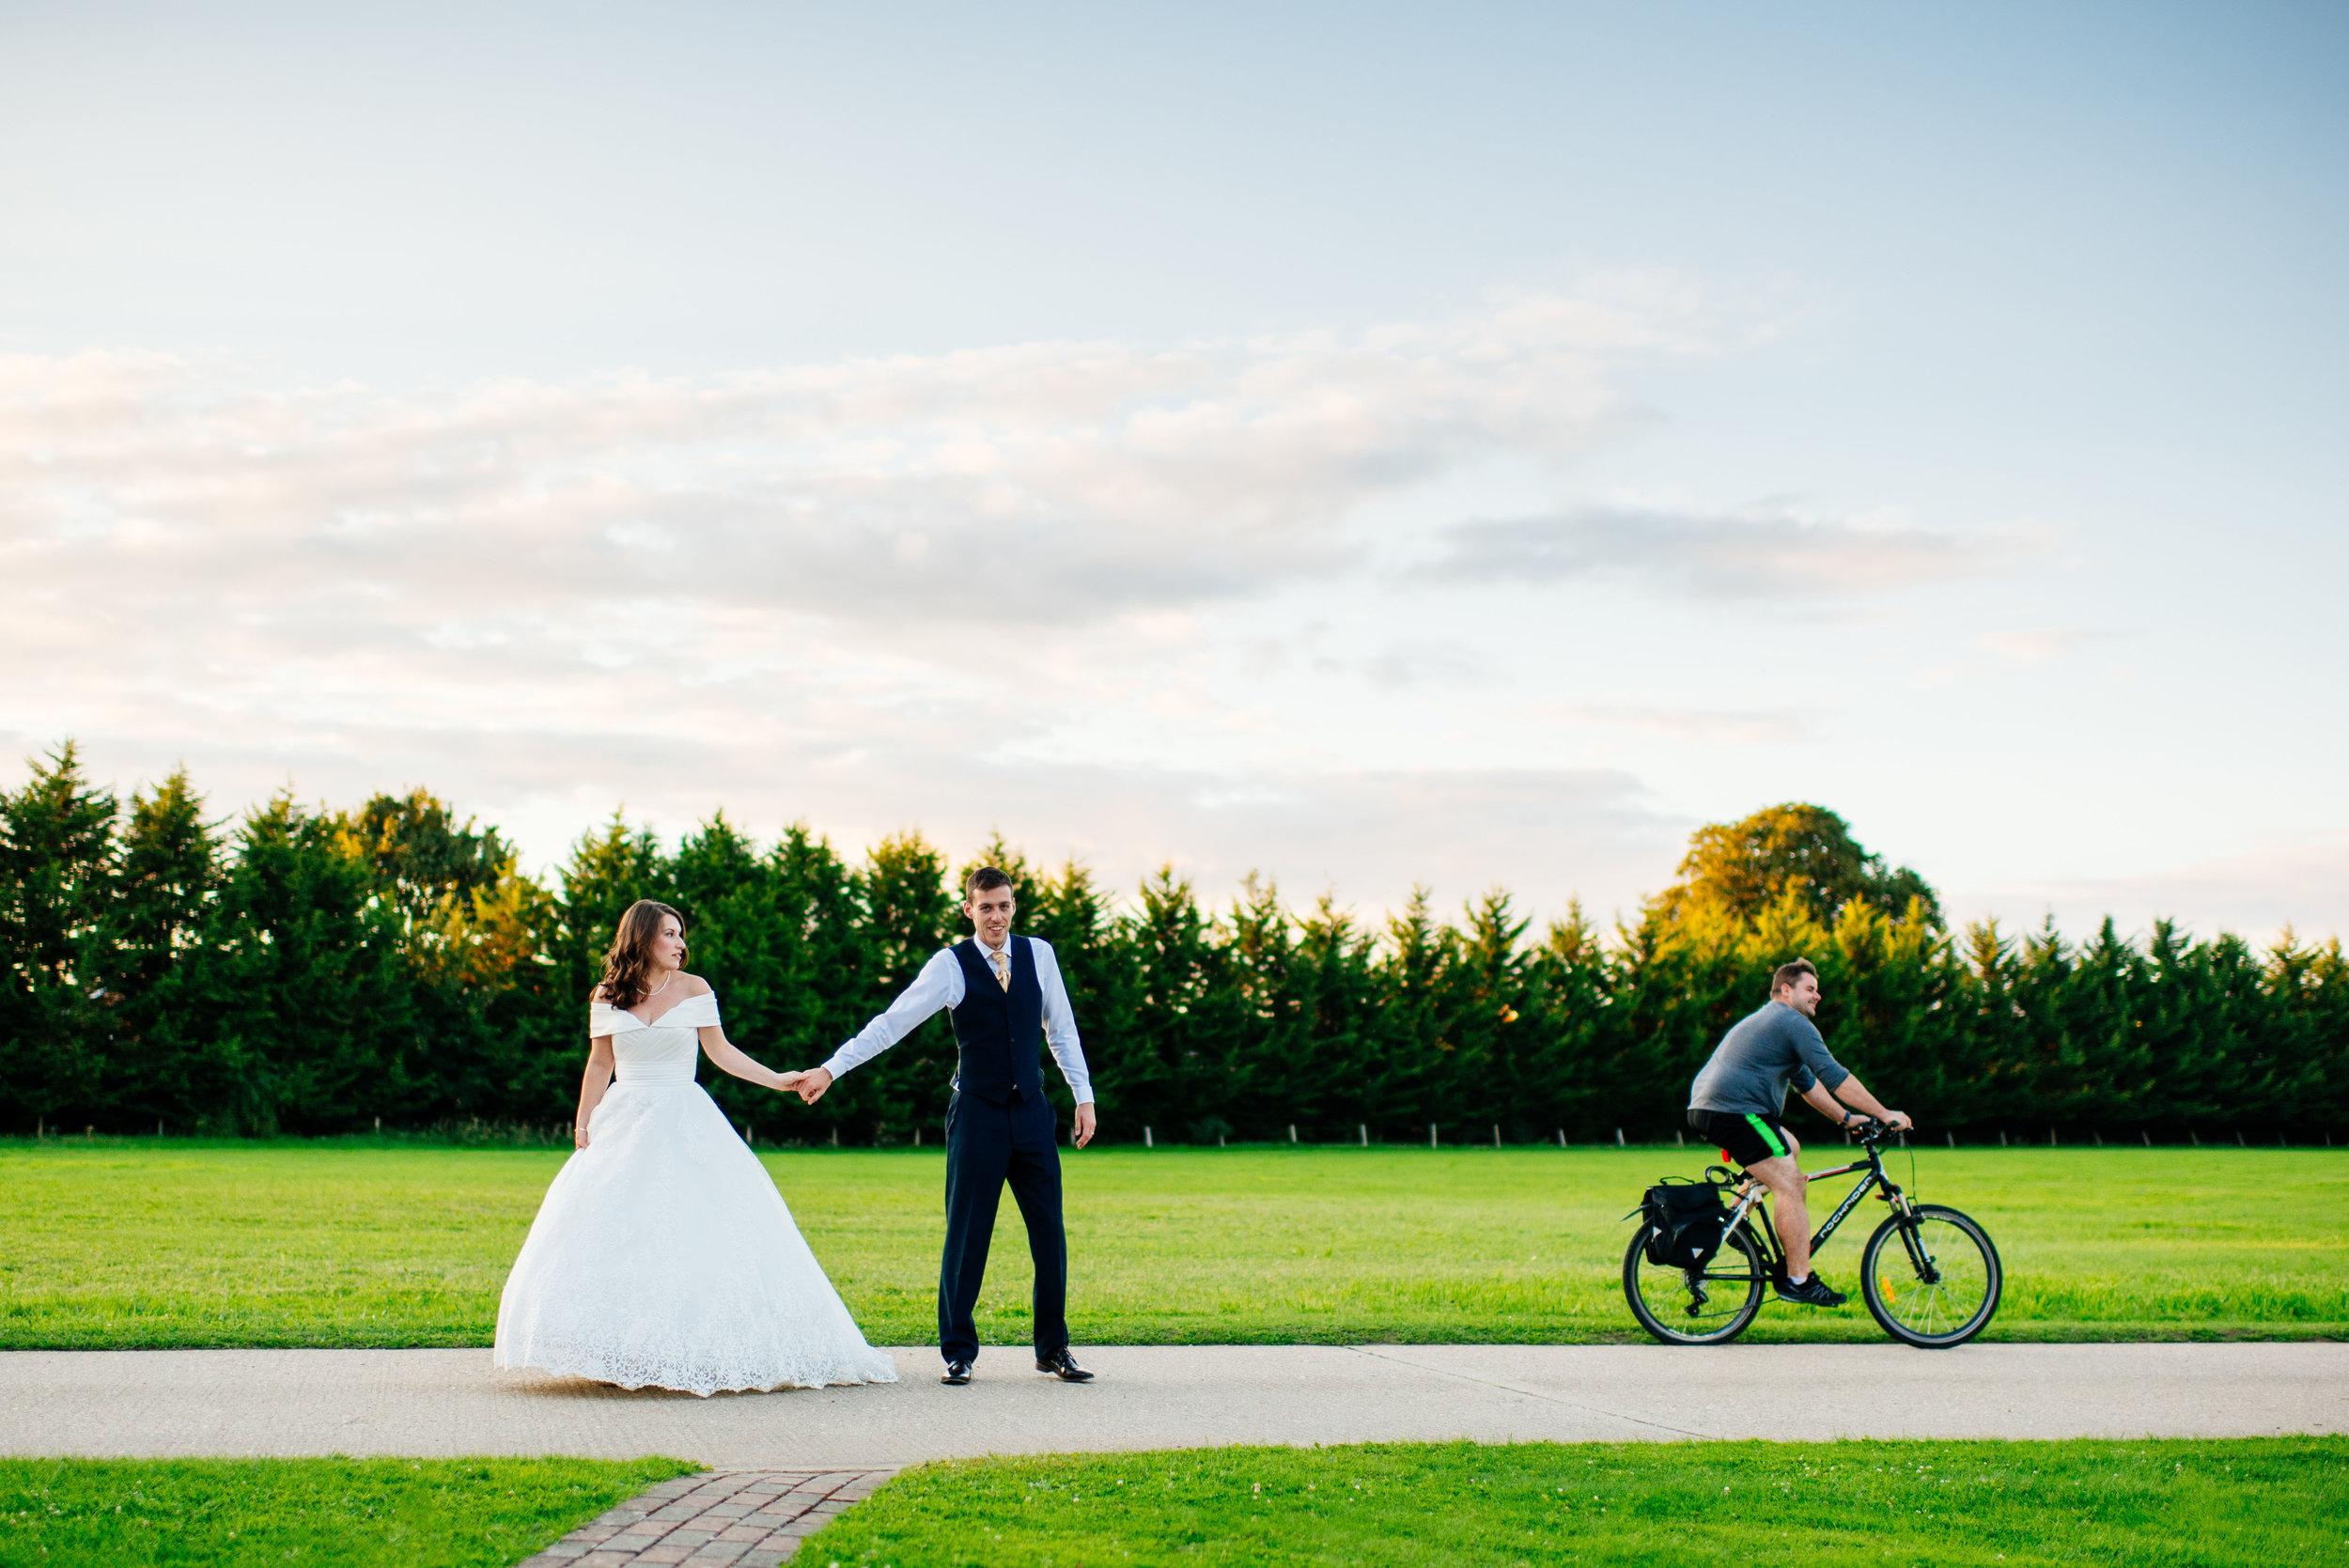 20 Lillibrooke Manor Berkshire Wedding Photography Bride Grrom Cyslists.jpg